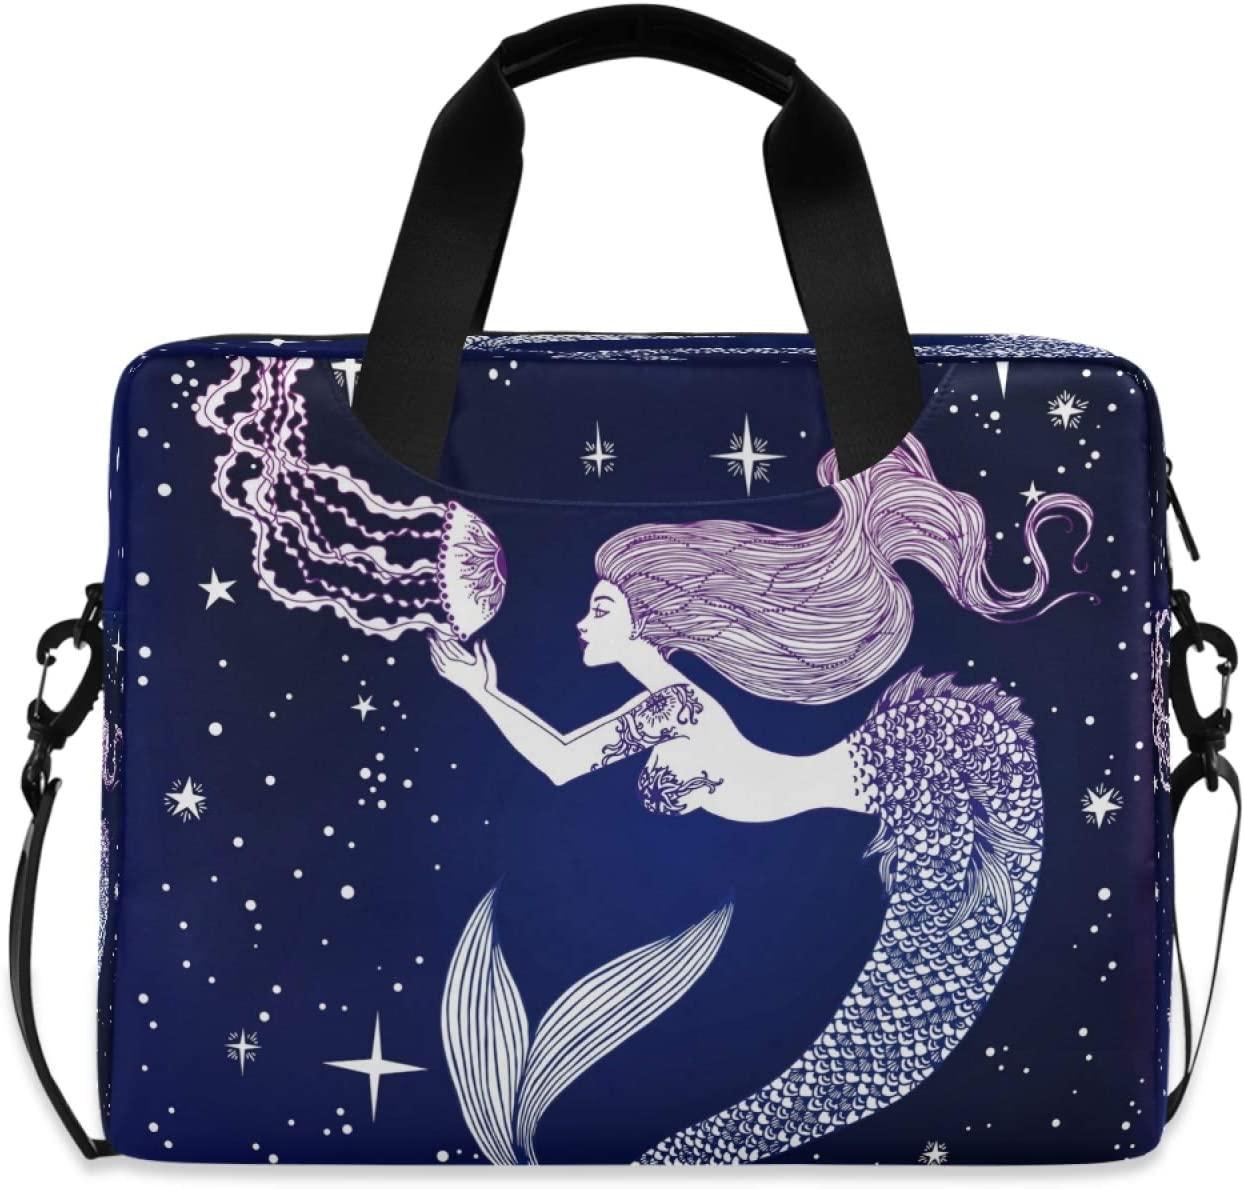 Yulife Sea Mermaid Jellyfish Laptop Bag Sleeve Case for Women Men Starry Briefcase Tablet Messenger Shoulder Bag with Strap Notebook Computer Case 14 15.6 16 Inch for Kids Girls Business